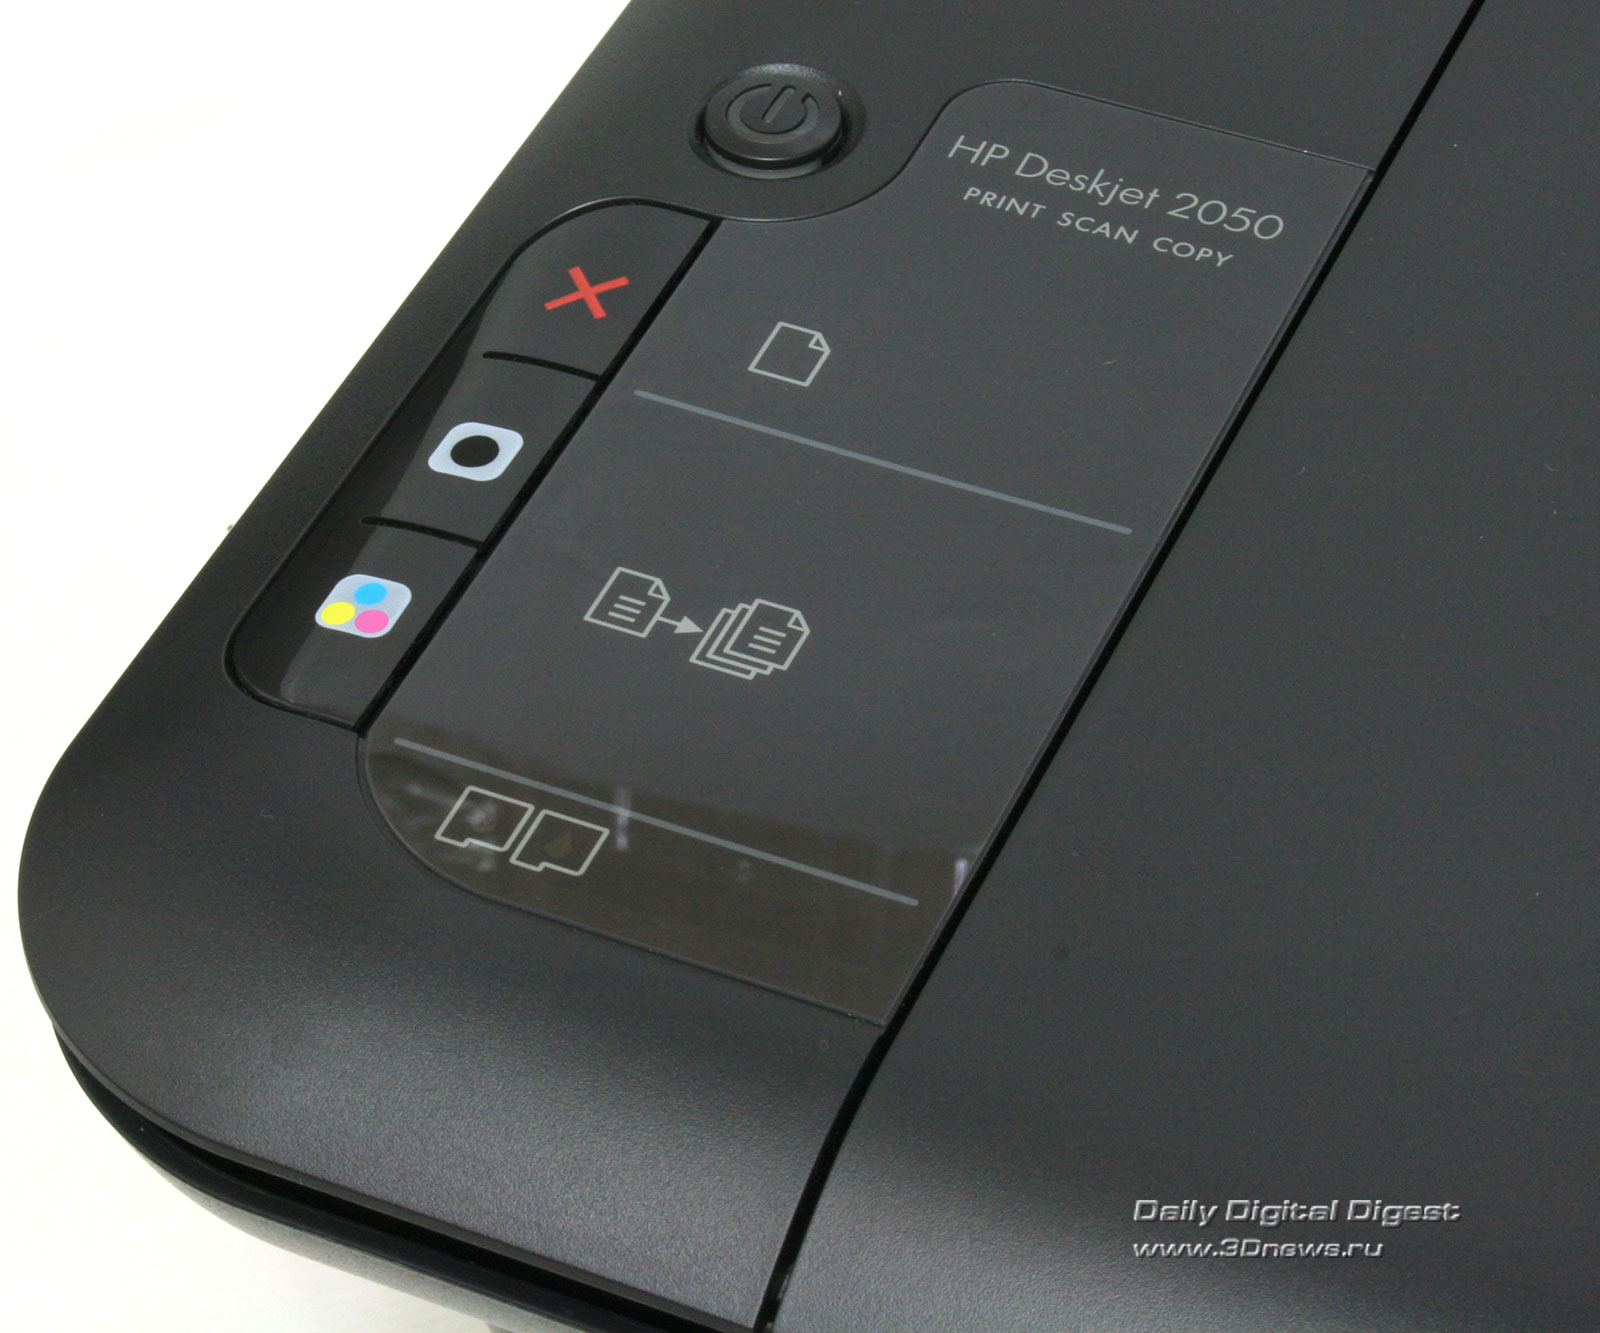 deskjet 2050 j510 series скачать драйвер